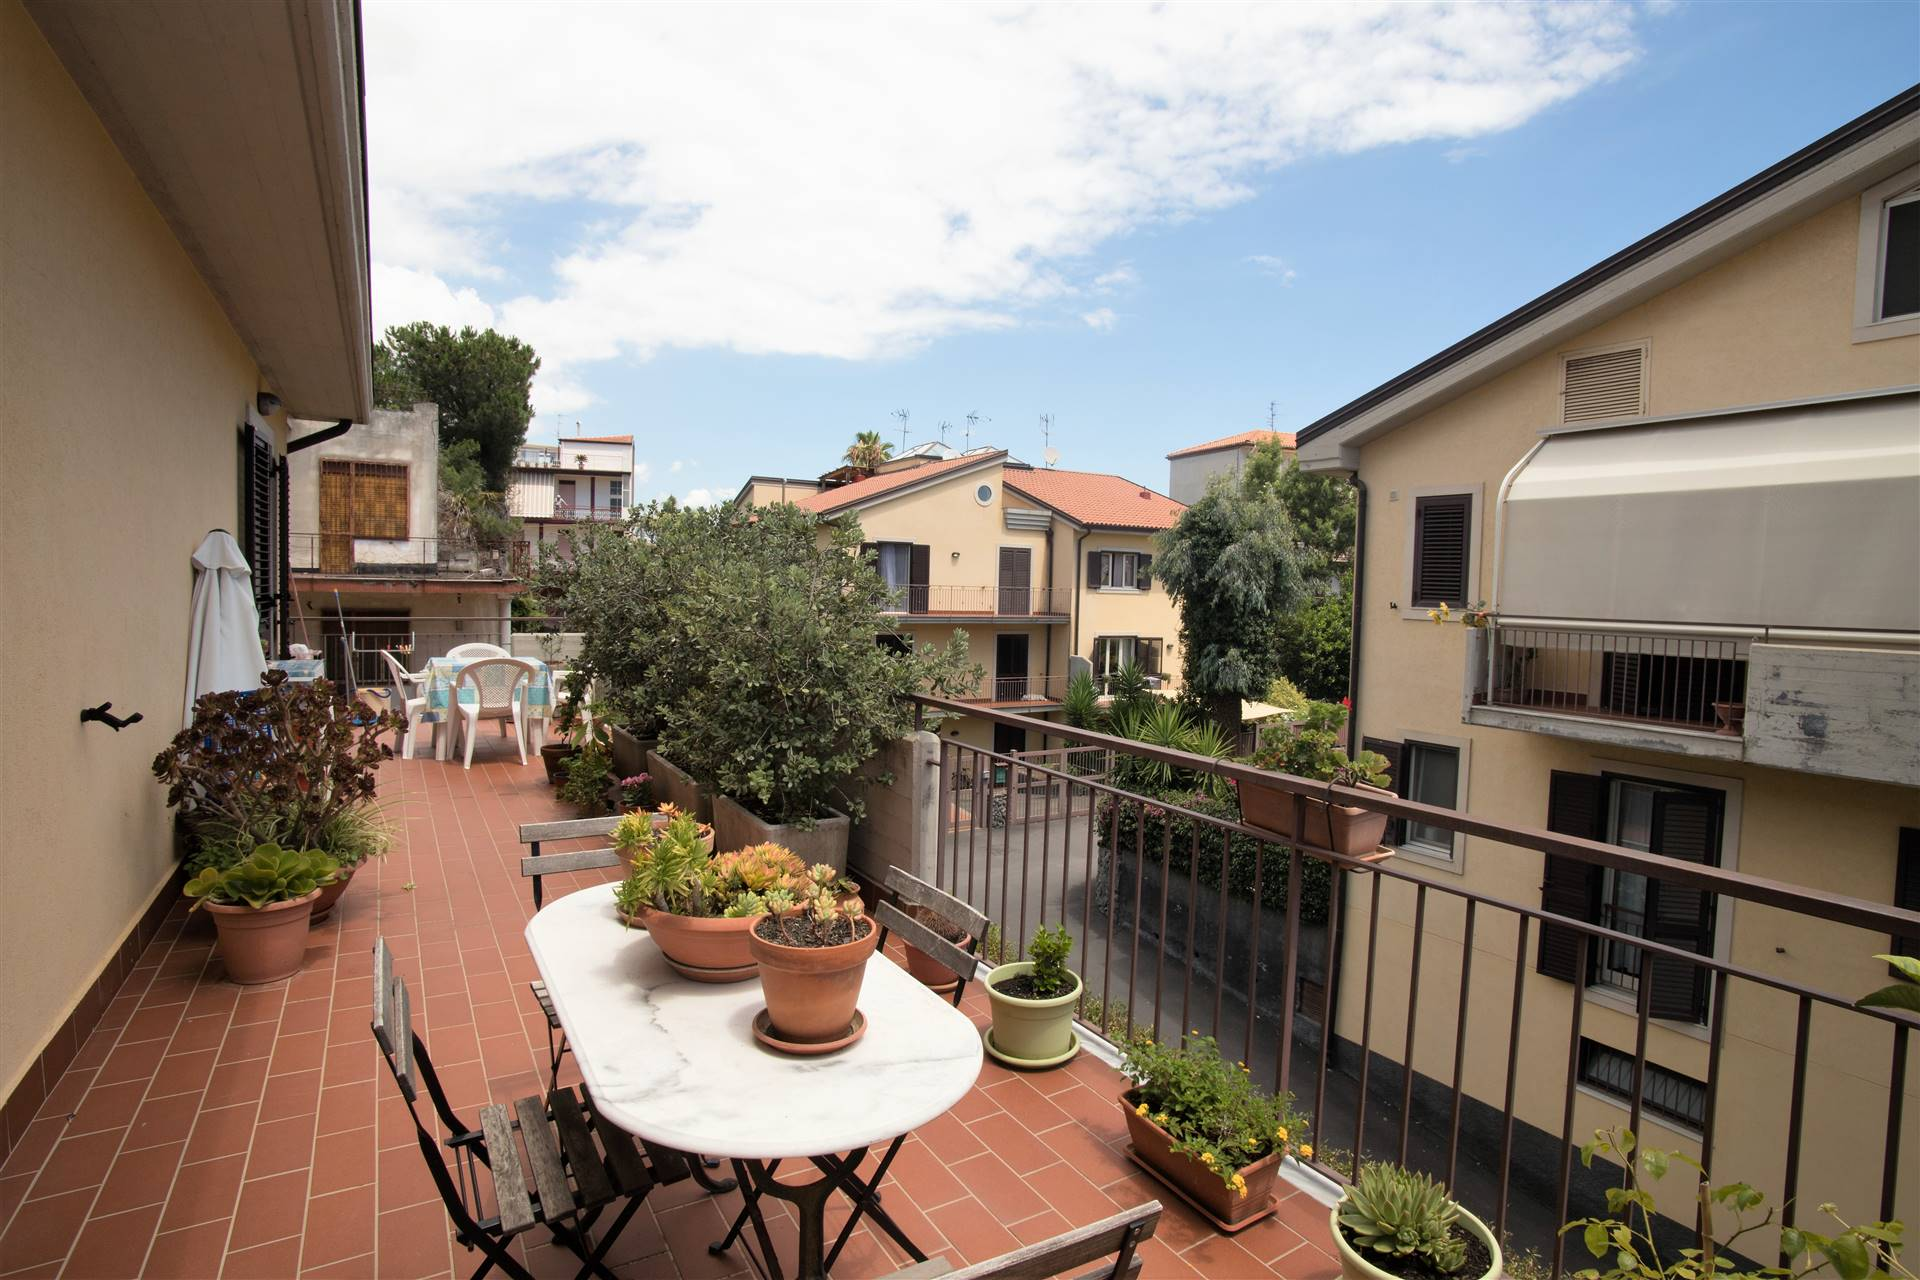 Appartamento In Vendita A San Gregorio Di Catania Catania Rif San Gregorio Centro